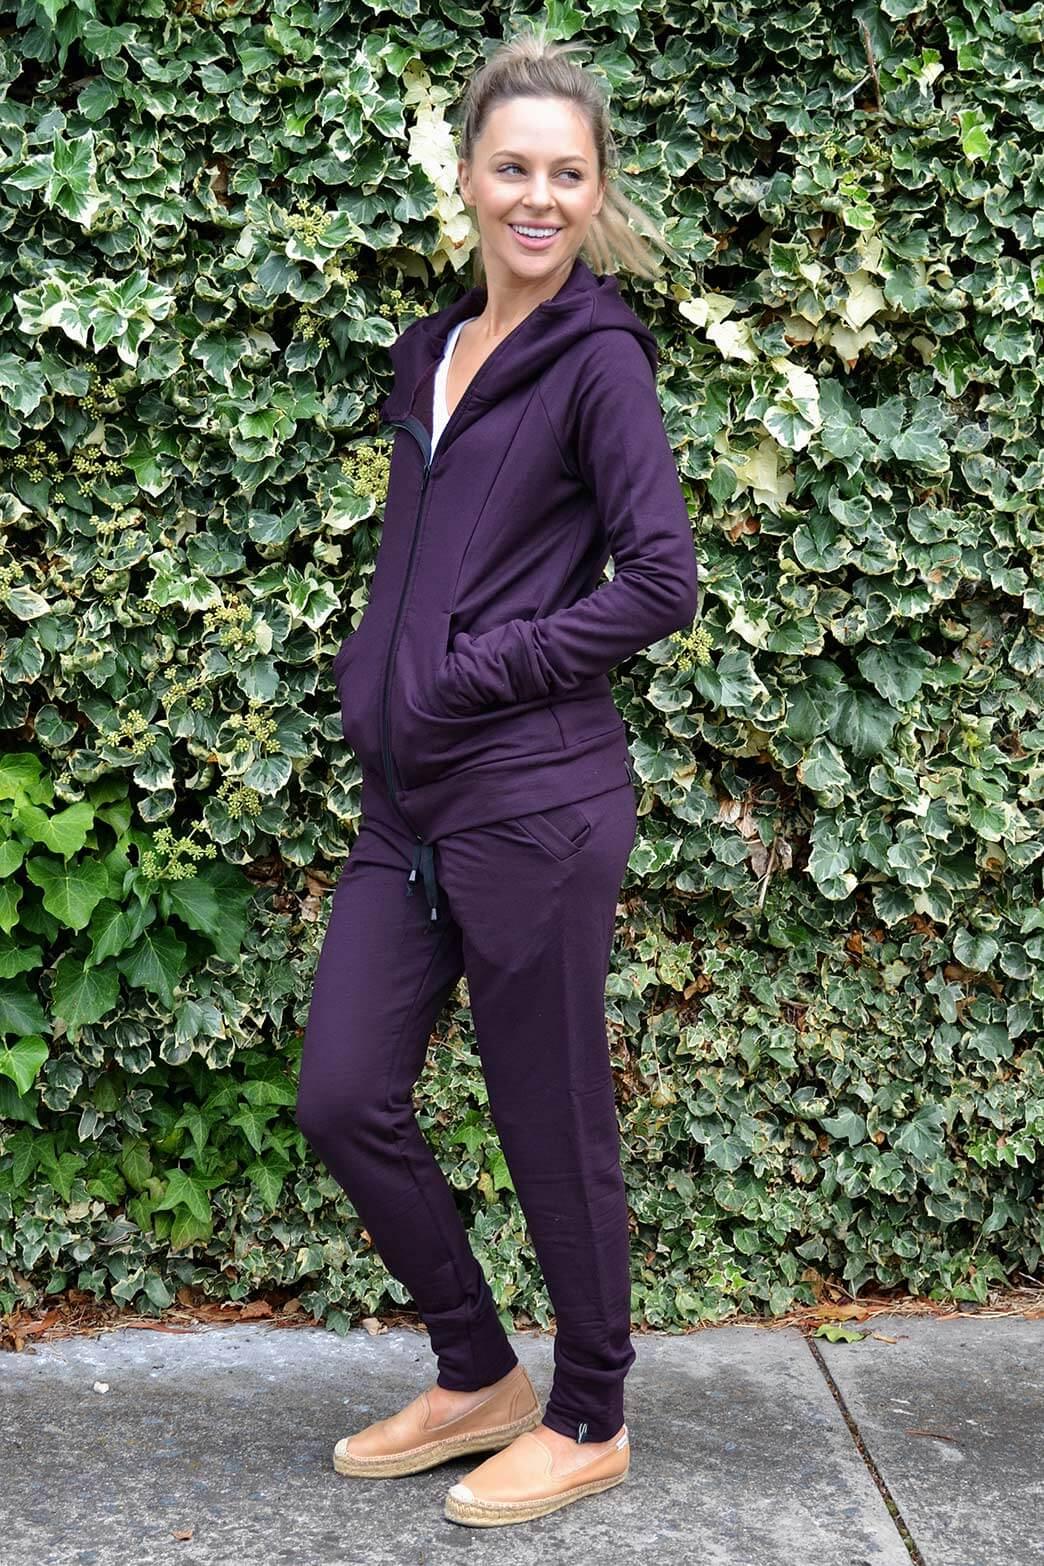 Track Set - Women's Plum Purple Wool Track Set of Lounge Pants and Fitted Hoody Jacket - Smitten Merino Tasmania Australia